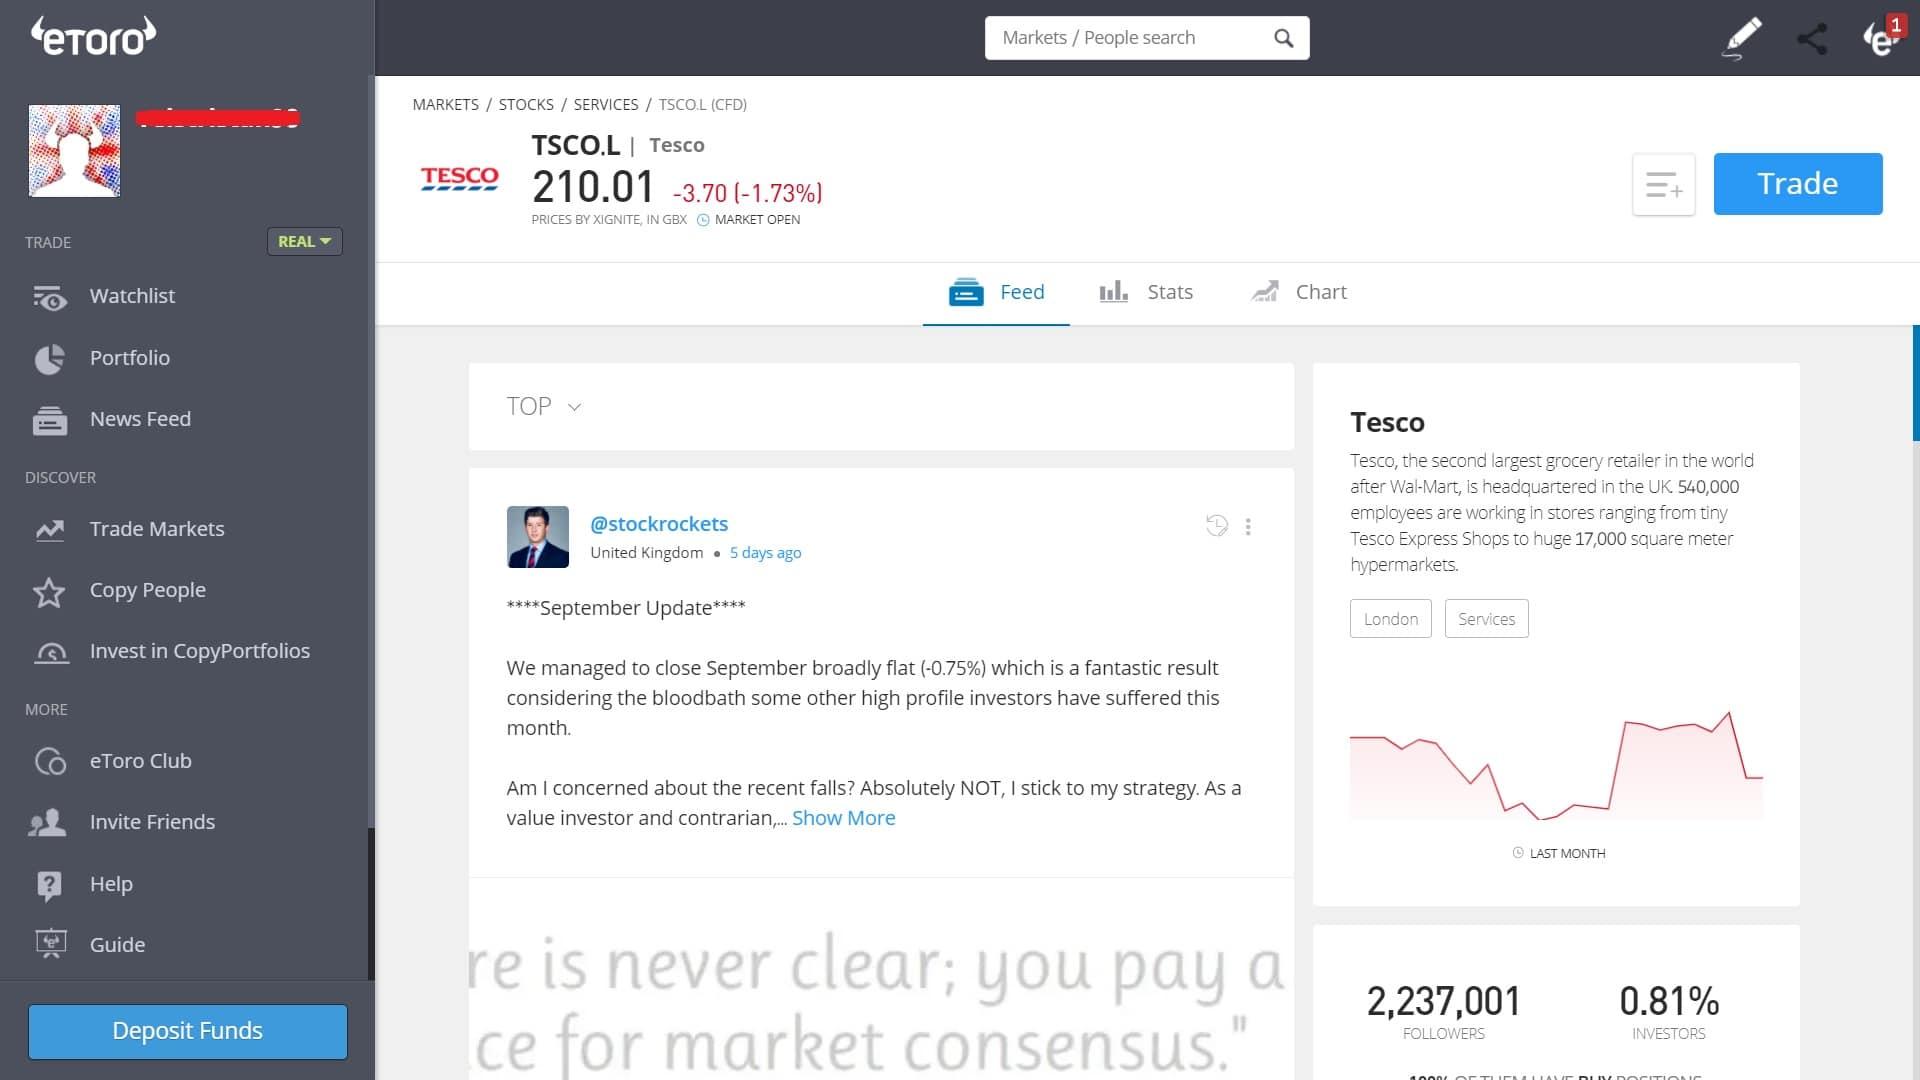 Tesco stock trading on eToro's platform